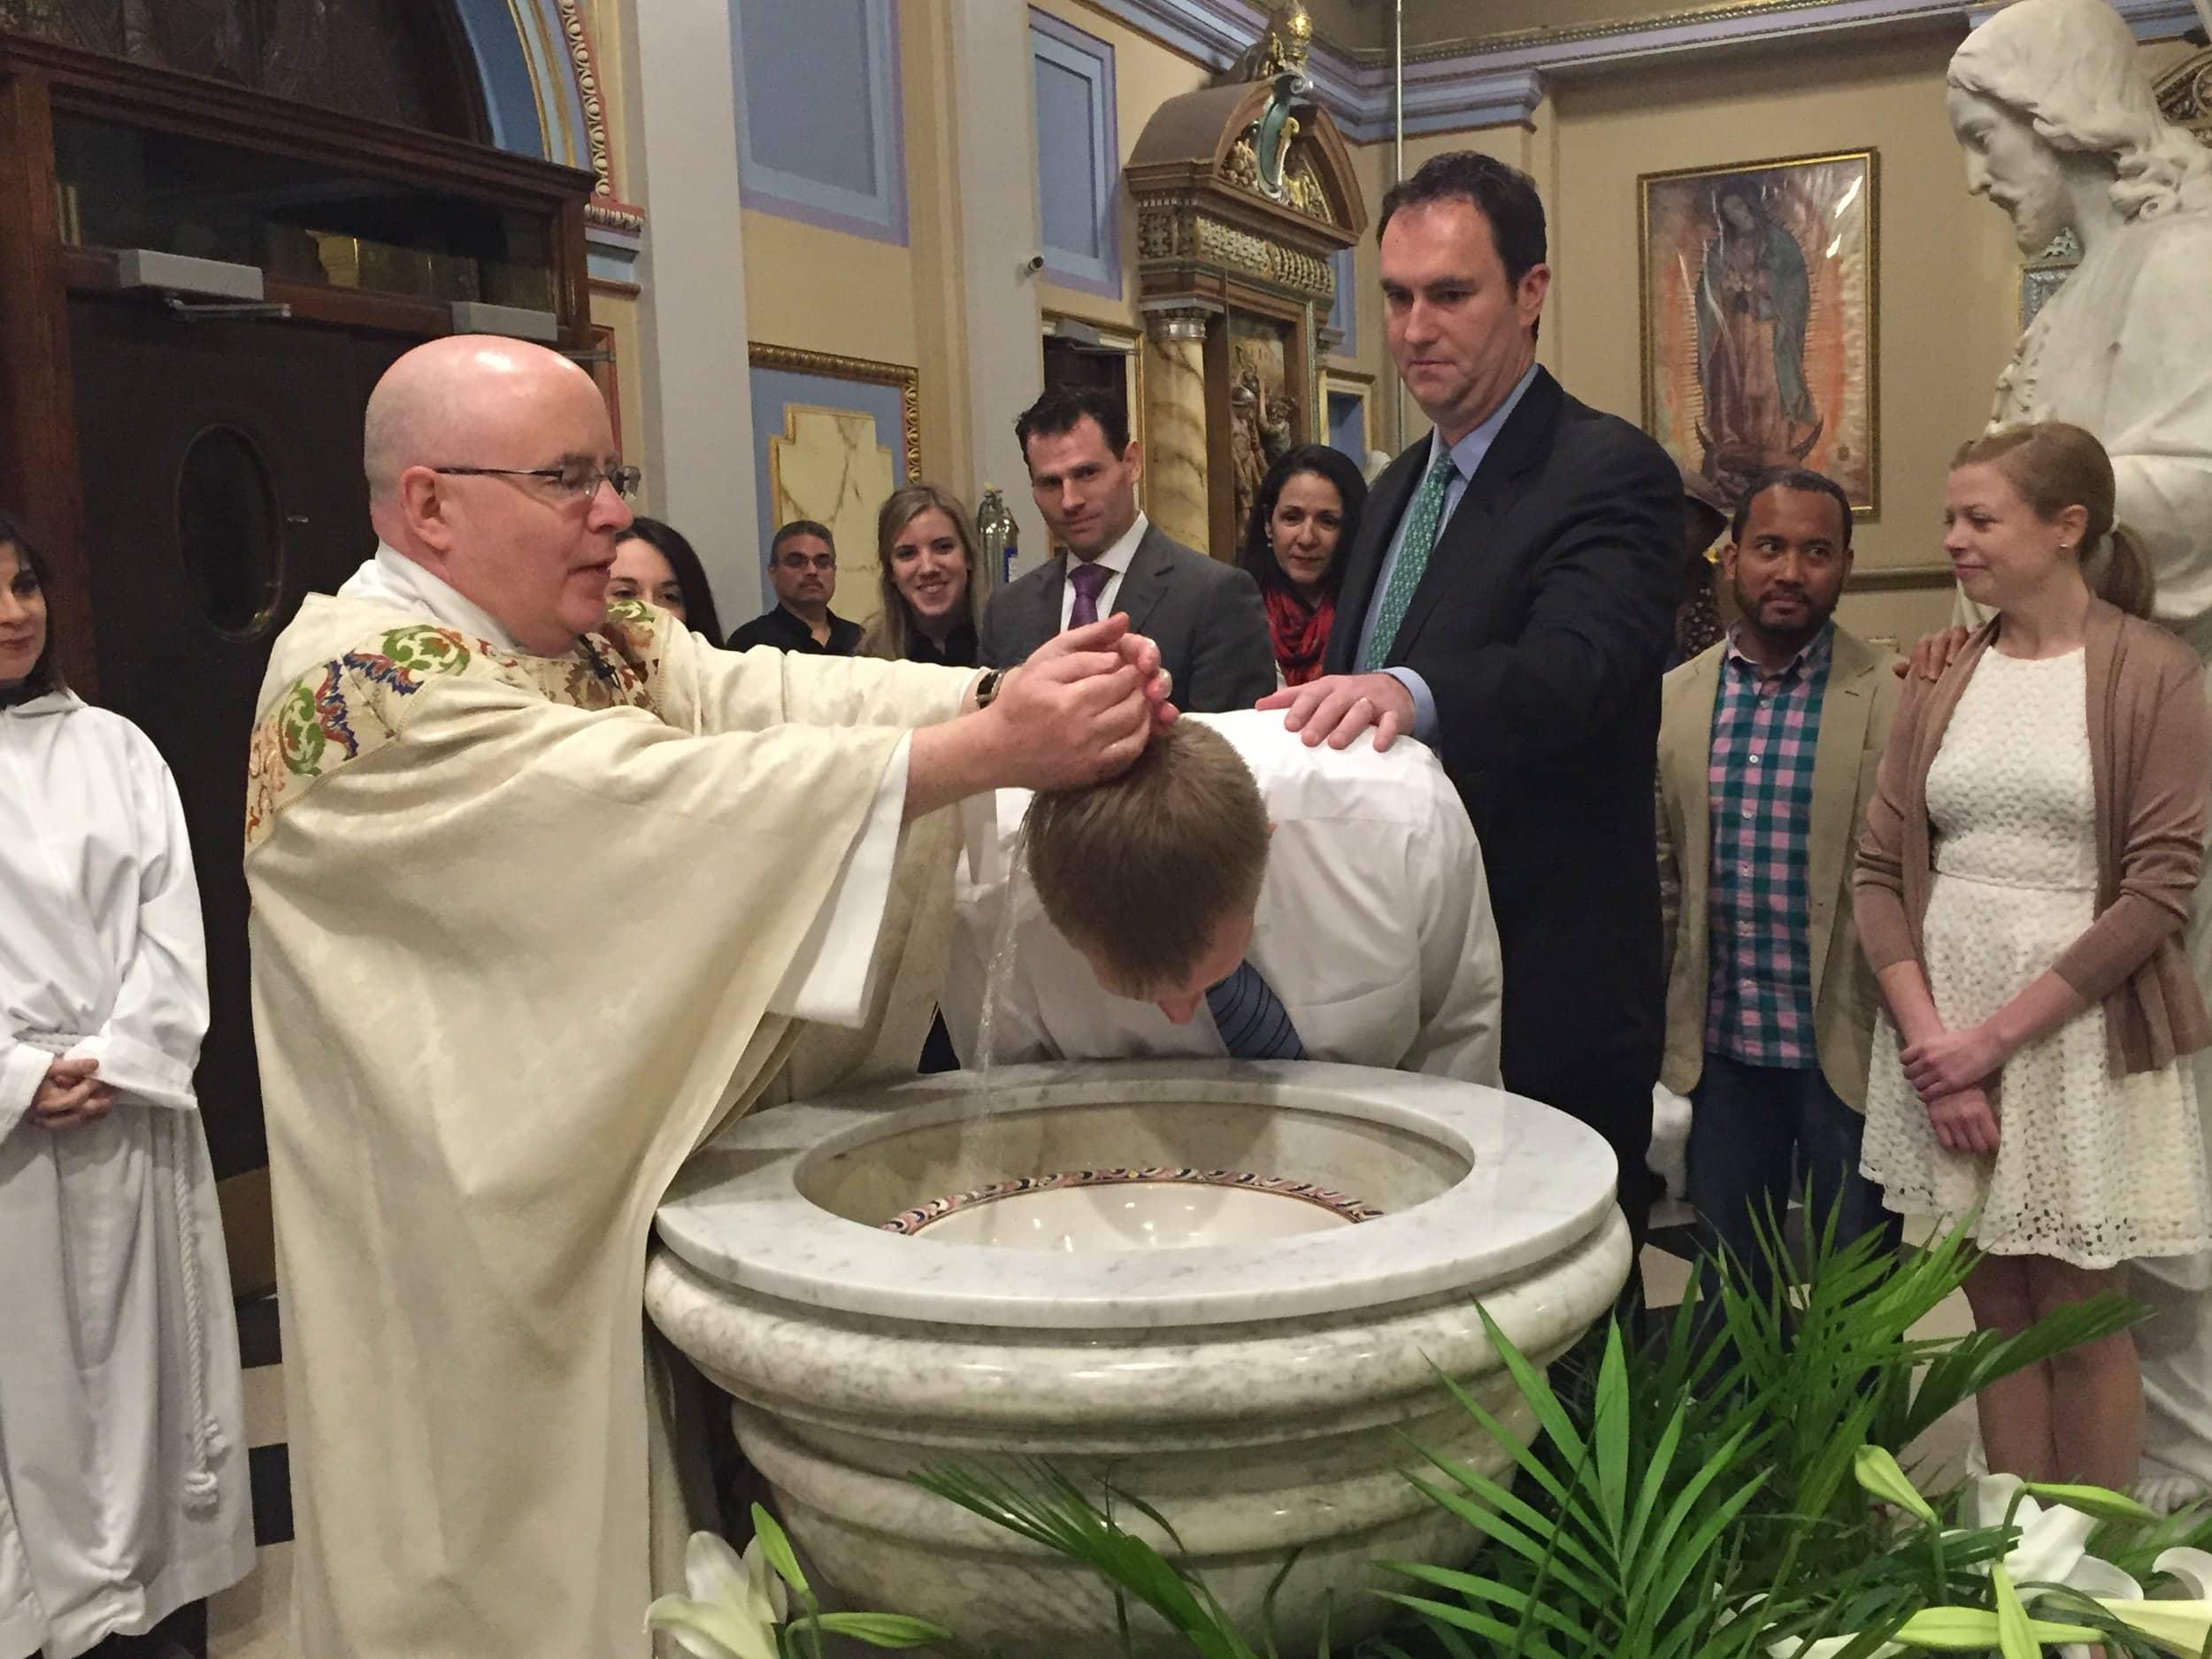 baptism_sacrament-first-st-francis-de-sales-church-new-york-city.jpg